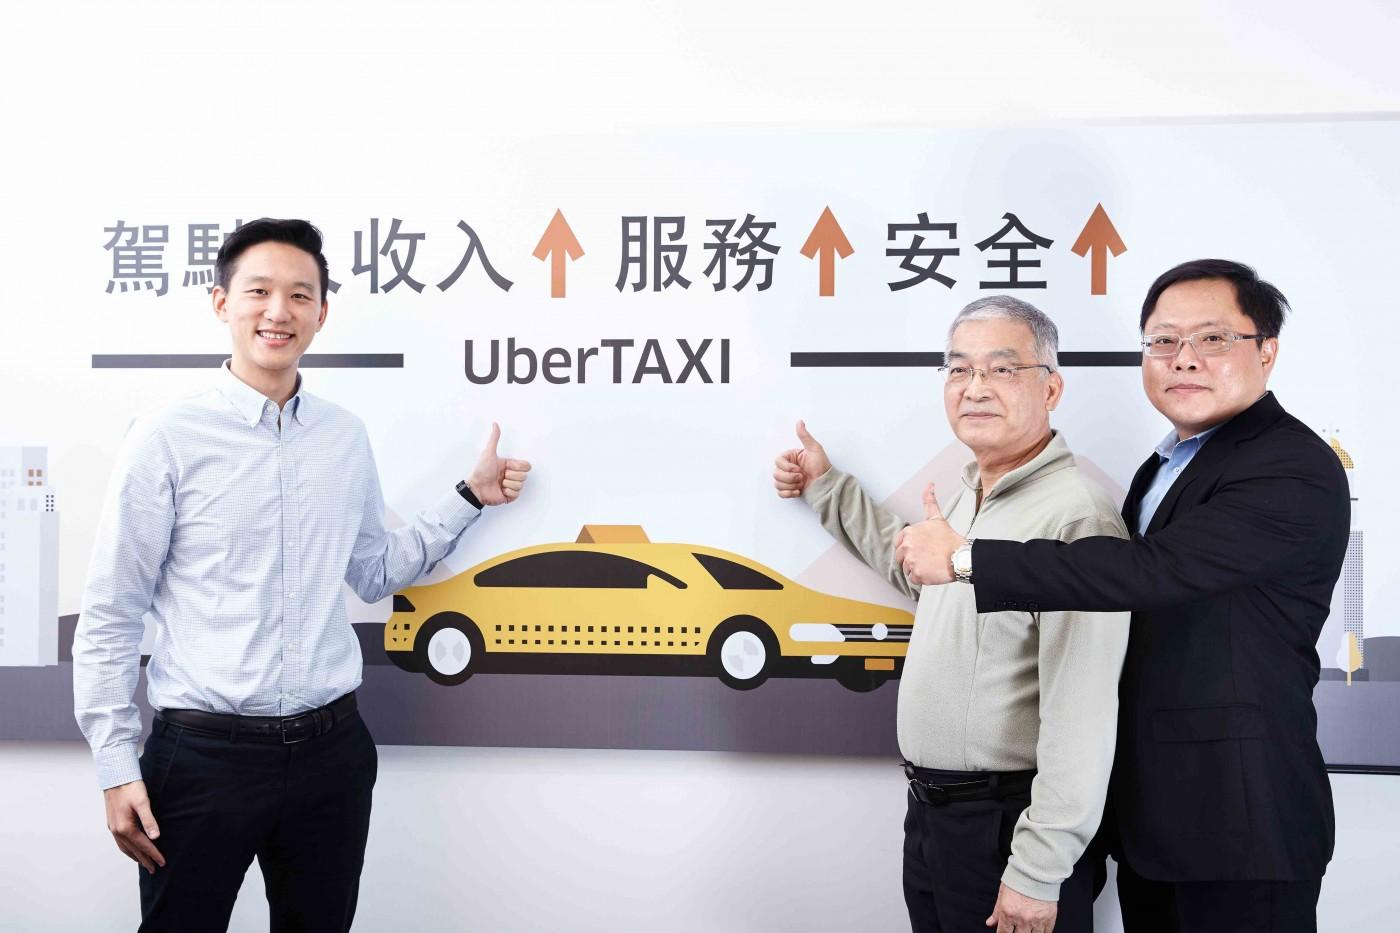 Uber找「計程車」工會合作推「UberTAXI」,二月份在台北上線